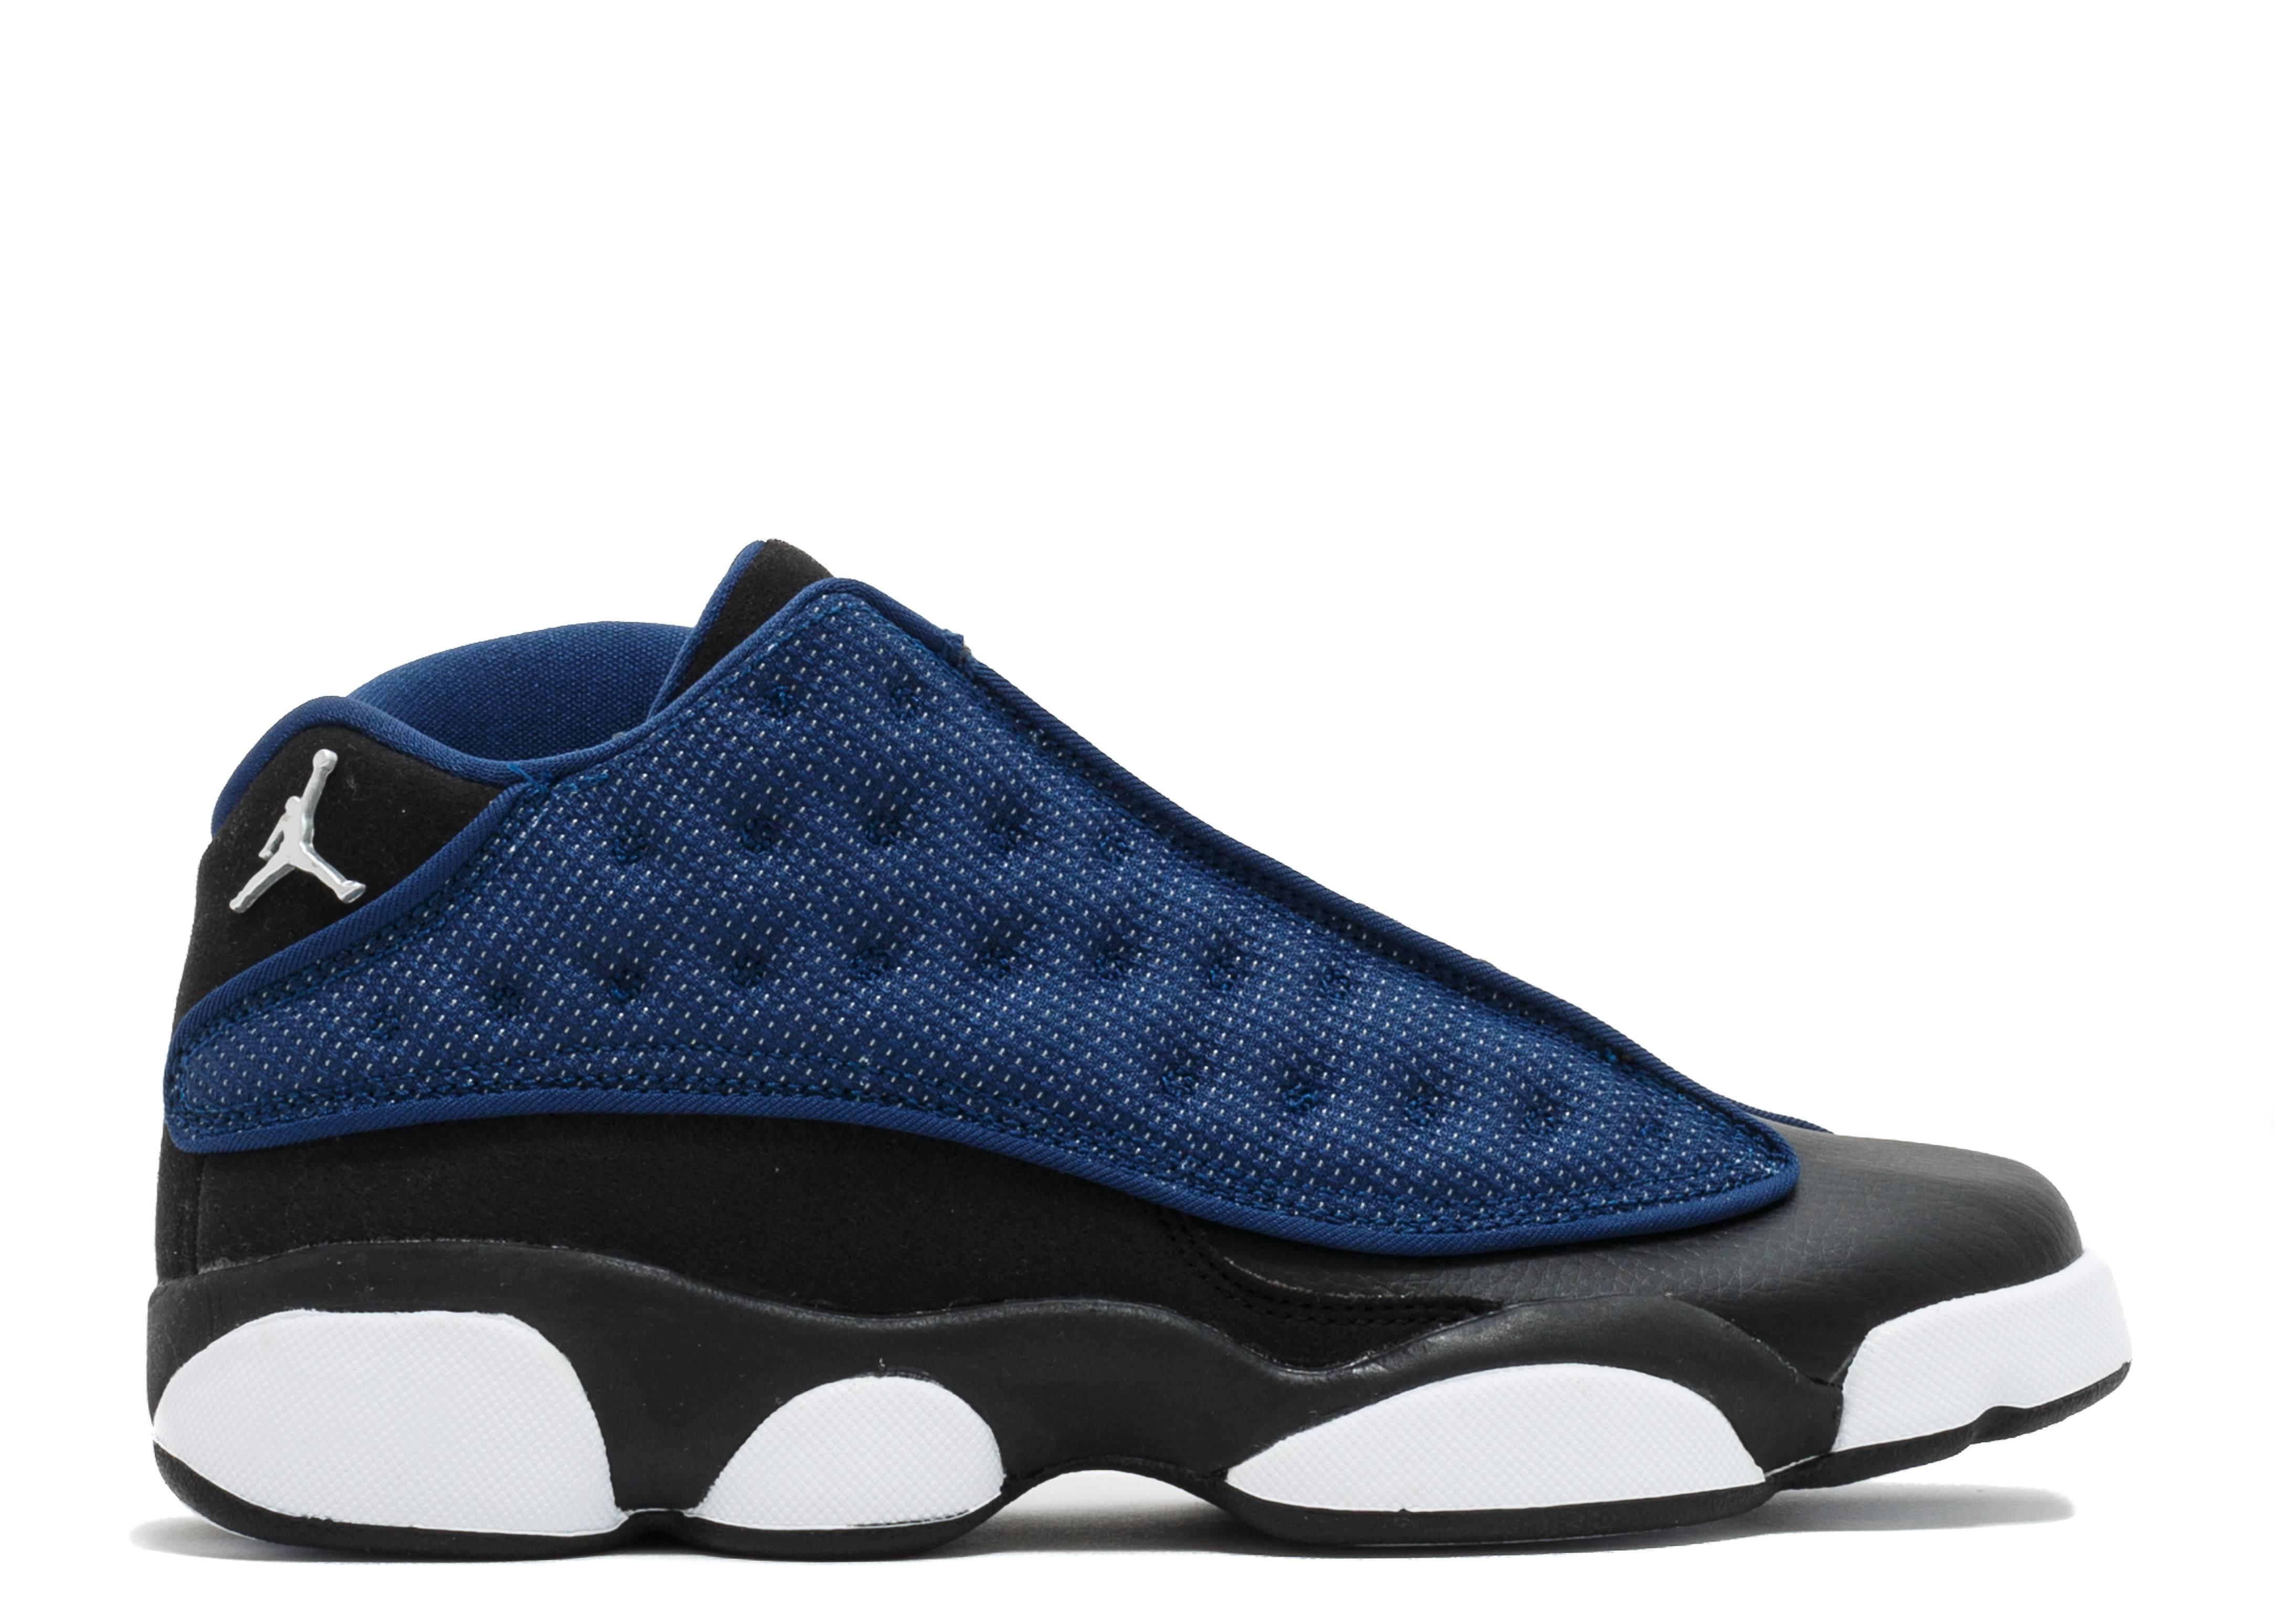 Air Jordan 13 Low Navy Metallic Silver Black Carolina Blue New Basketball Shoes